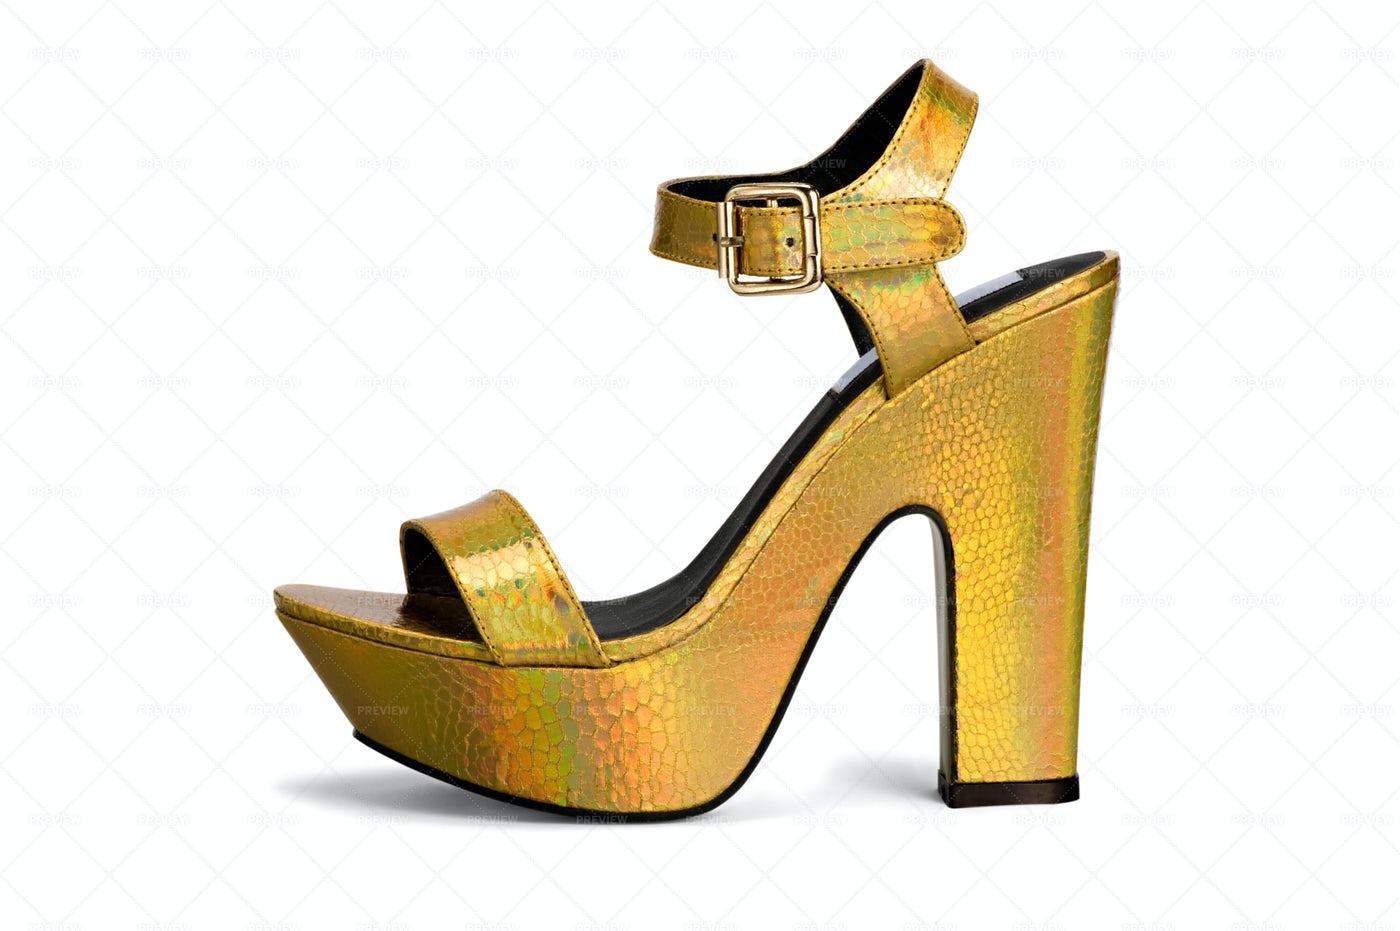 Elegant Metallic Gold High Heel Sandal: Stock Photos